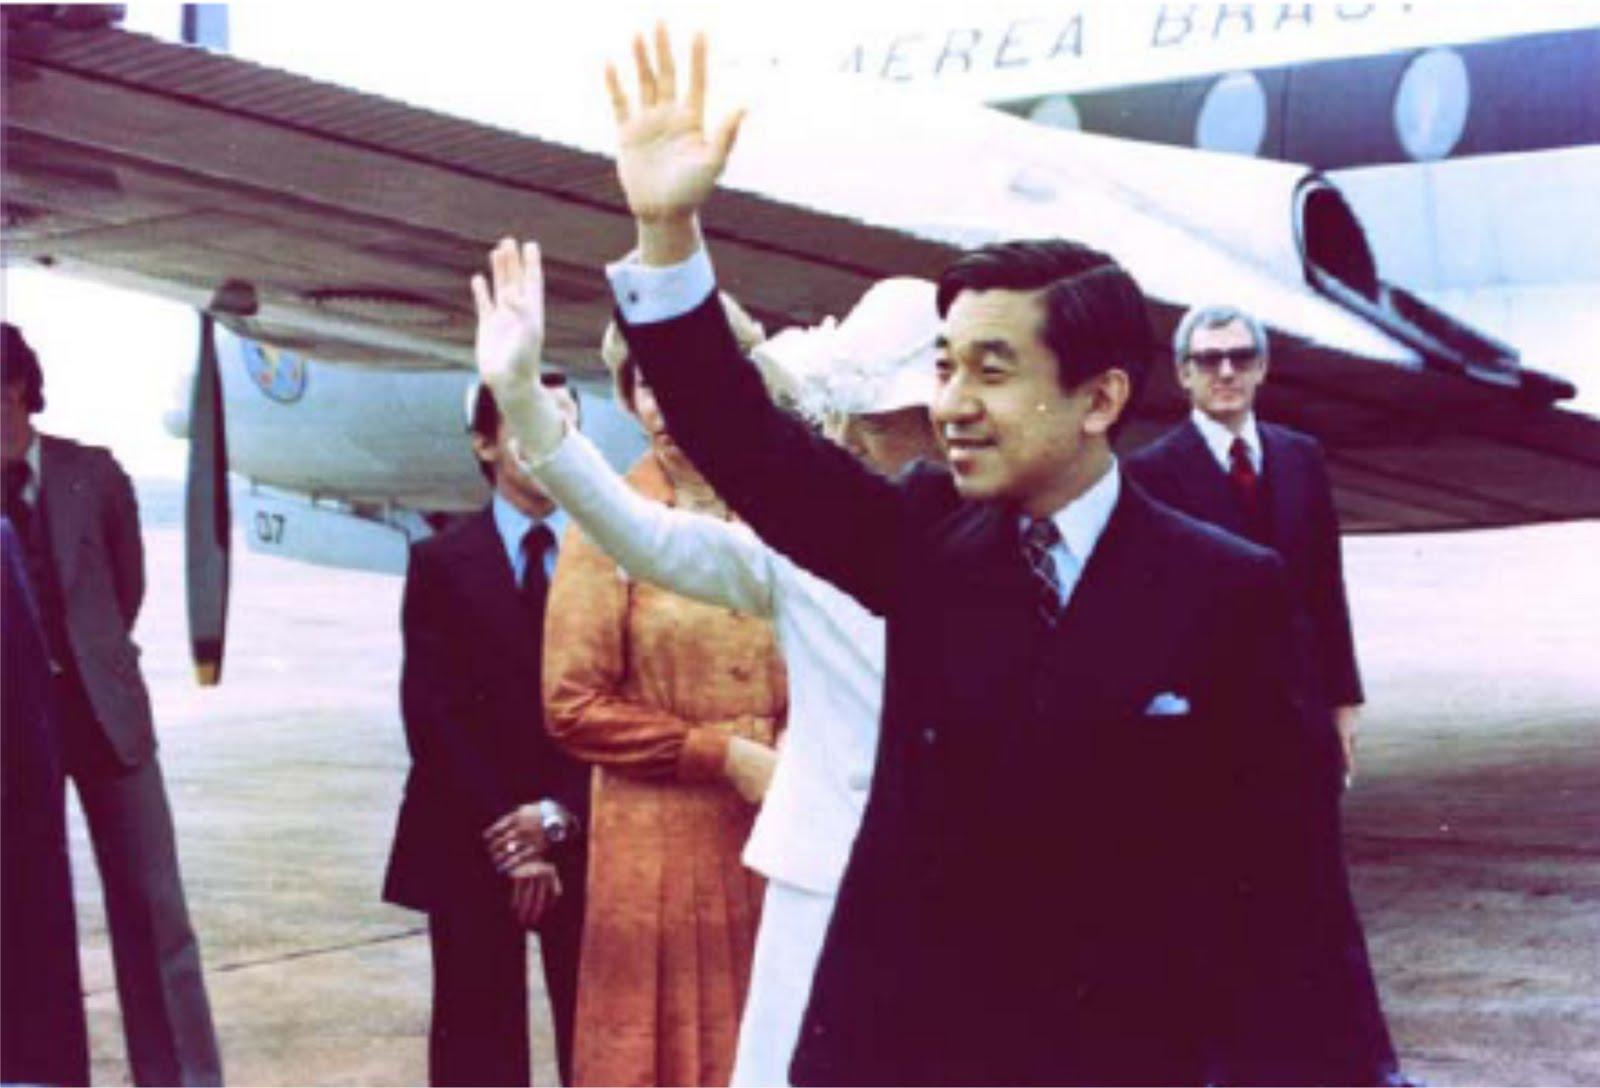 Visita do Príncipe Akihito e Princesa Michiko - 1978